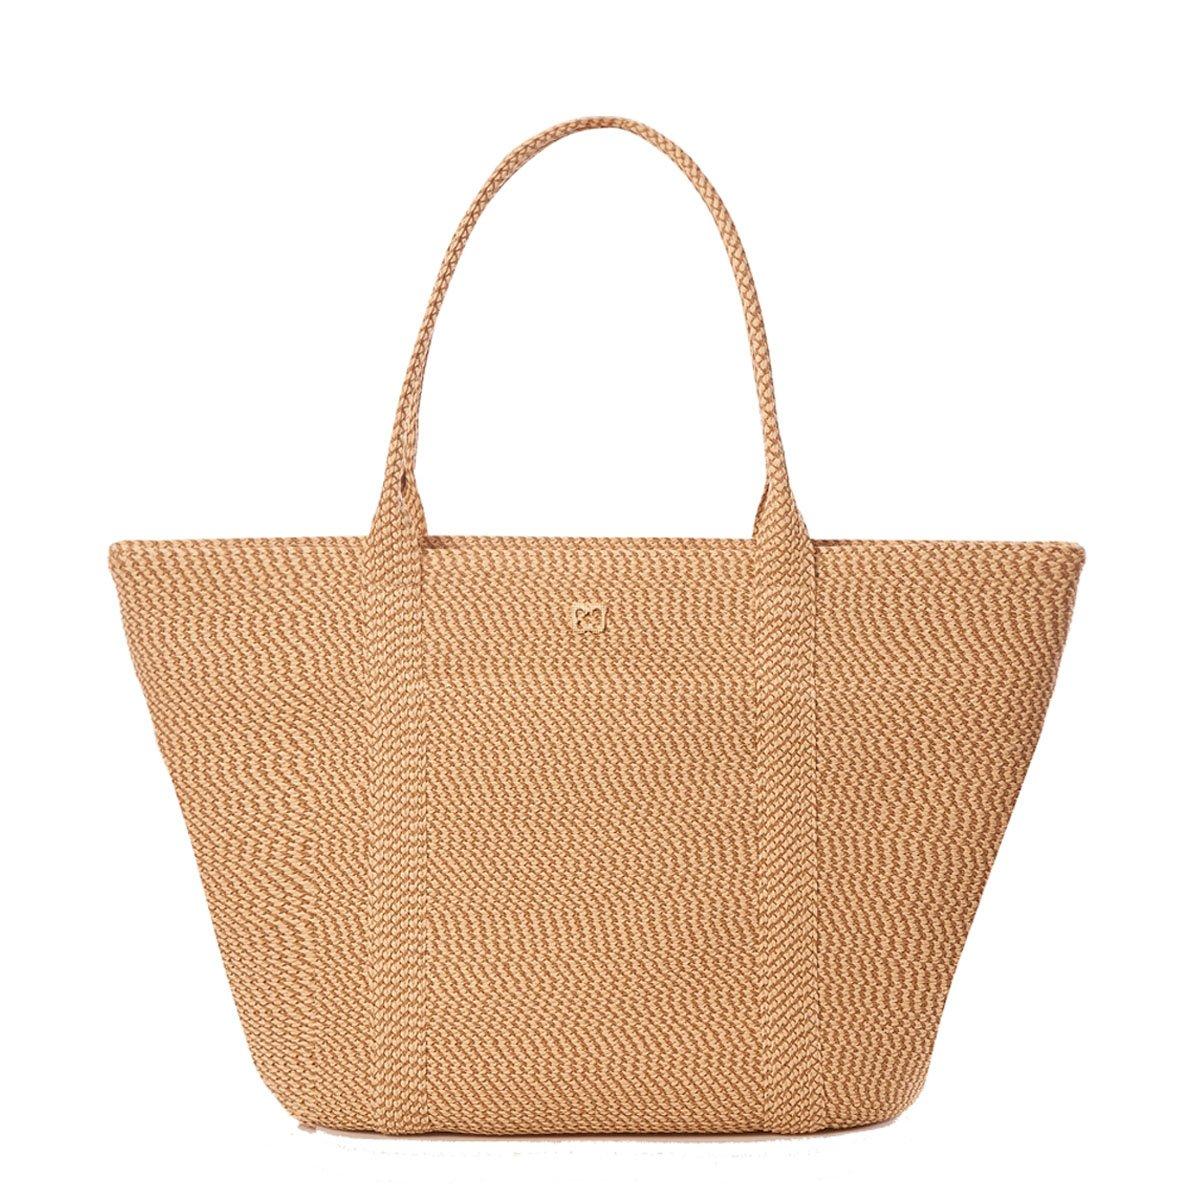 Eric Javits Luxury Fashion Designer Women's Handbag - Prep Tote - Peanut